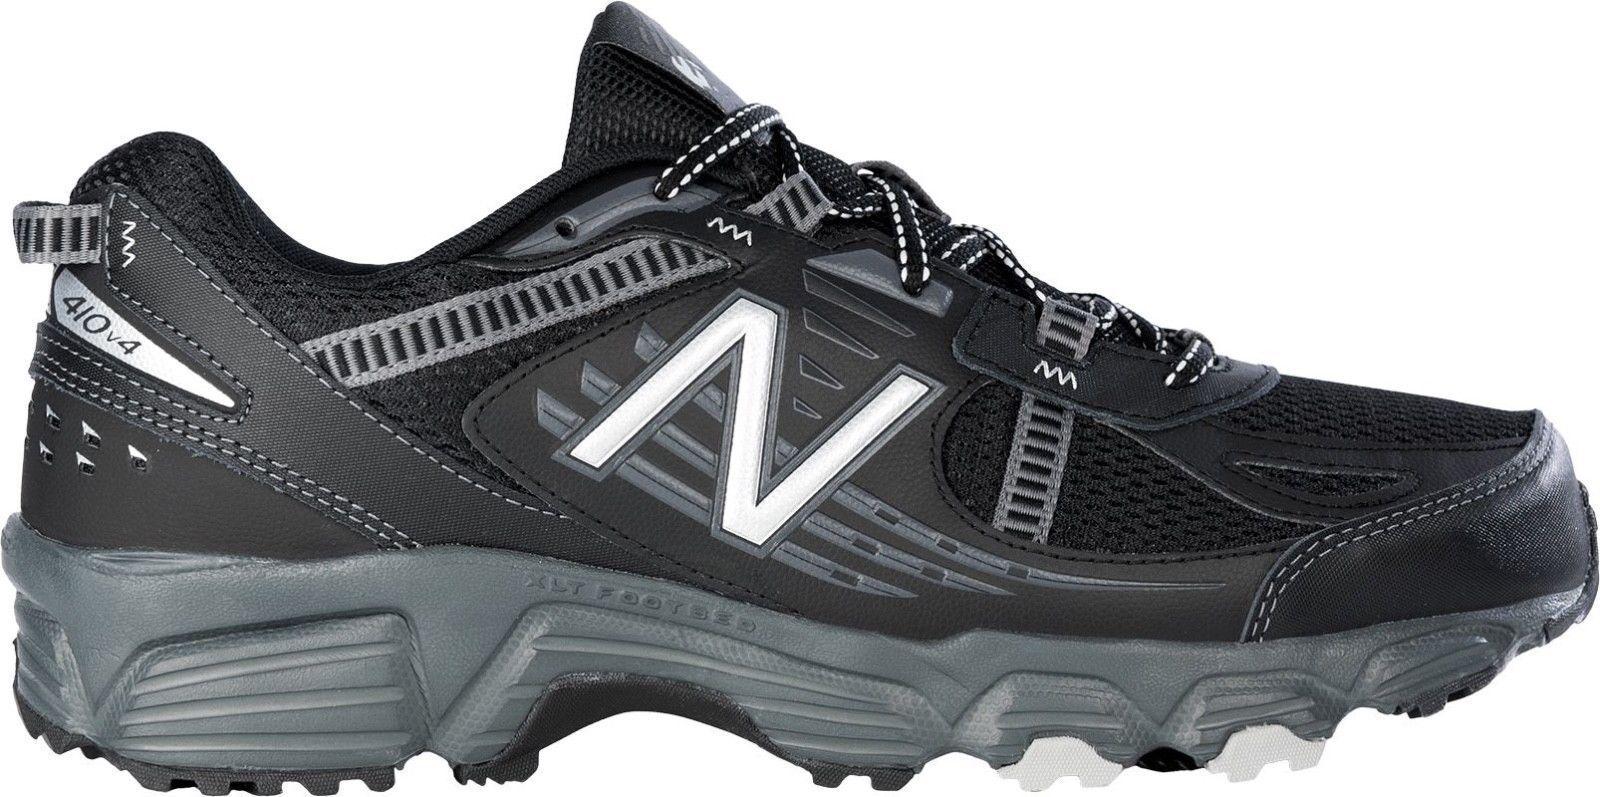 Men's New Balance MT410BS4 Trail Running shoes Sizes 7 thru 8